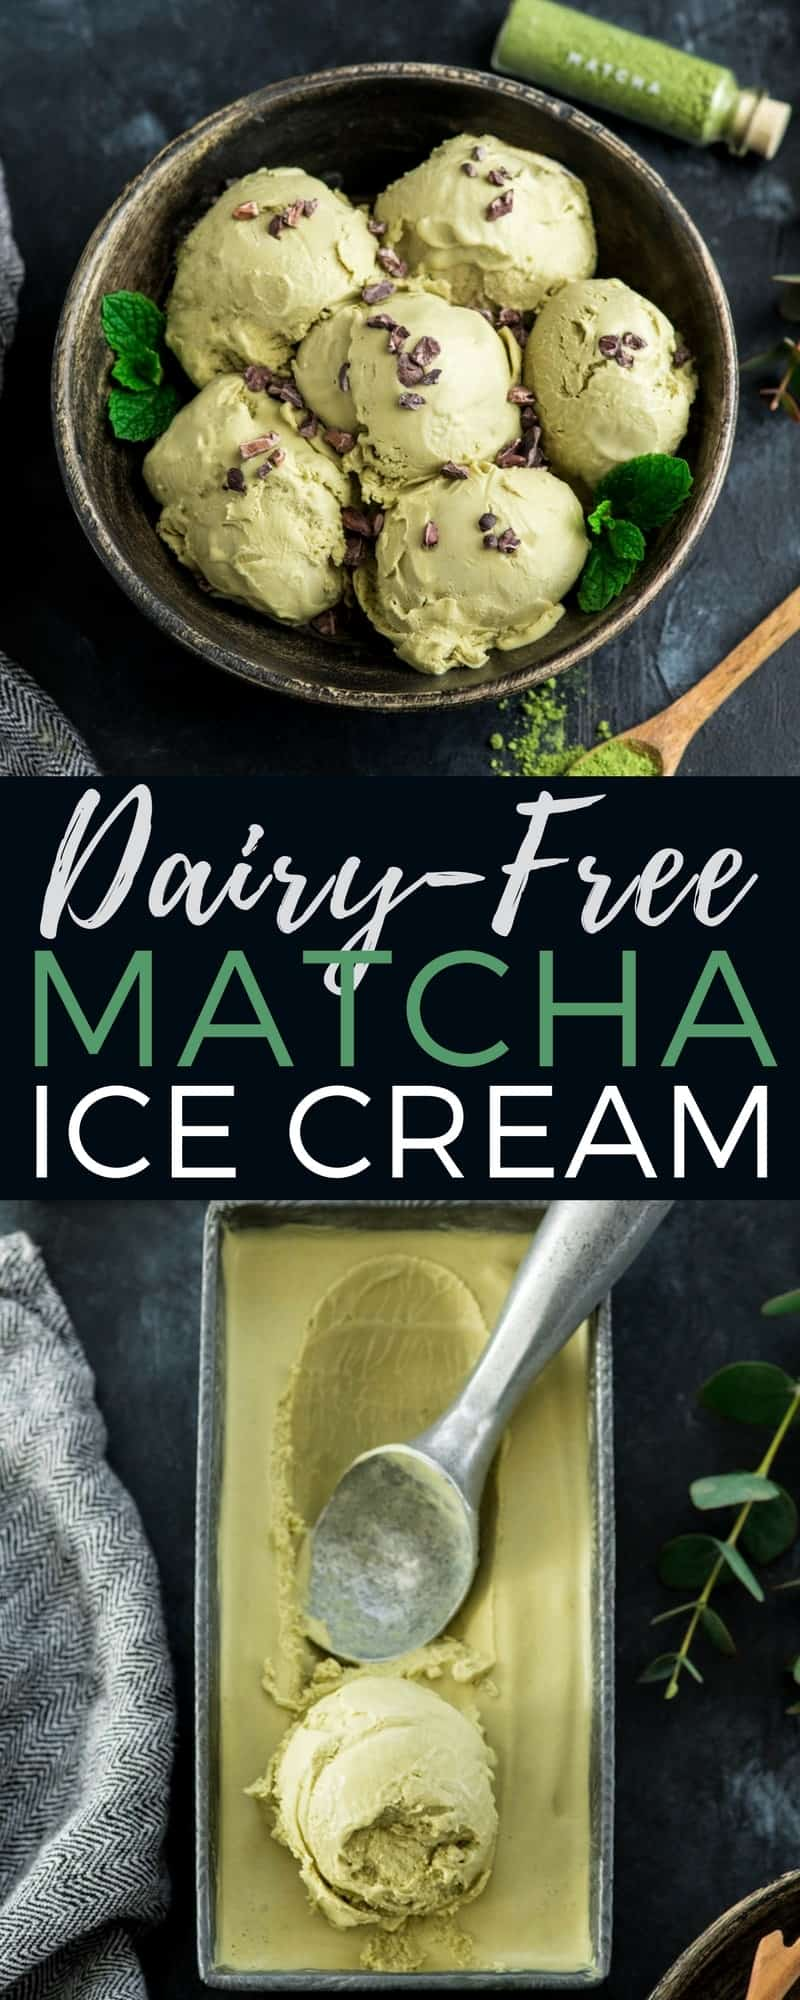 This Dairy-Free Matcha Ice Cream is so creamy and smooth that no one would guess it's healthy! #matcha #icecream #greentea #dairyfree #vegan #paleo #glutenfree #refinedsugarfree #dessertrecipe #healthydessert #healthyrecipe #recipevideo